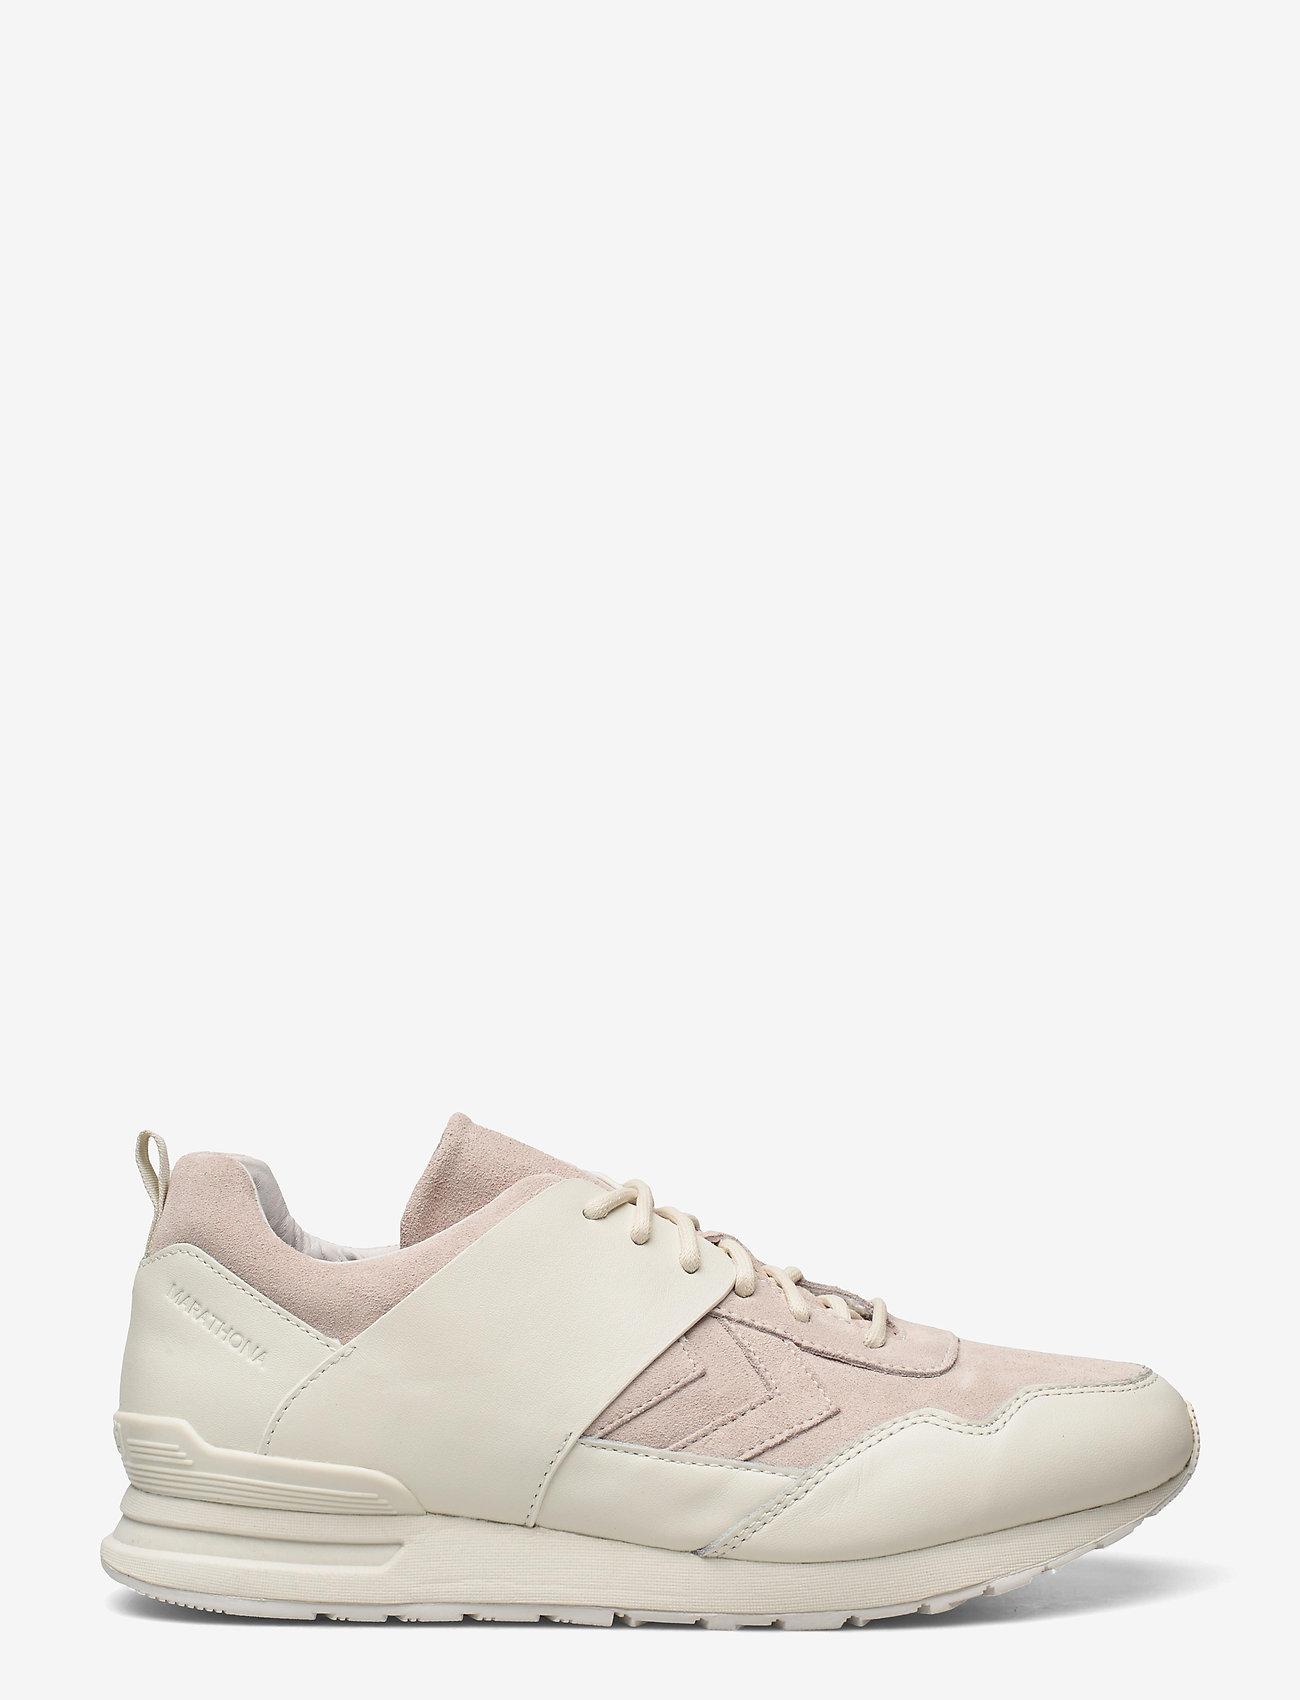 Hummel - MARATHONA 424 ATTACK - laag sneakers - off white - 0